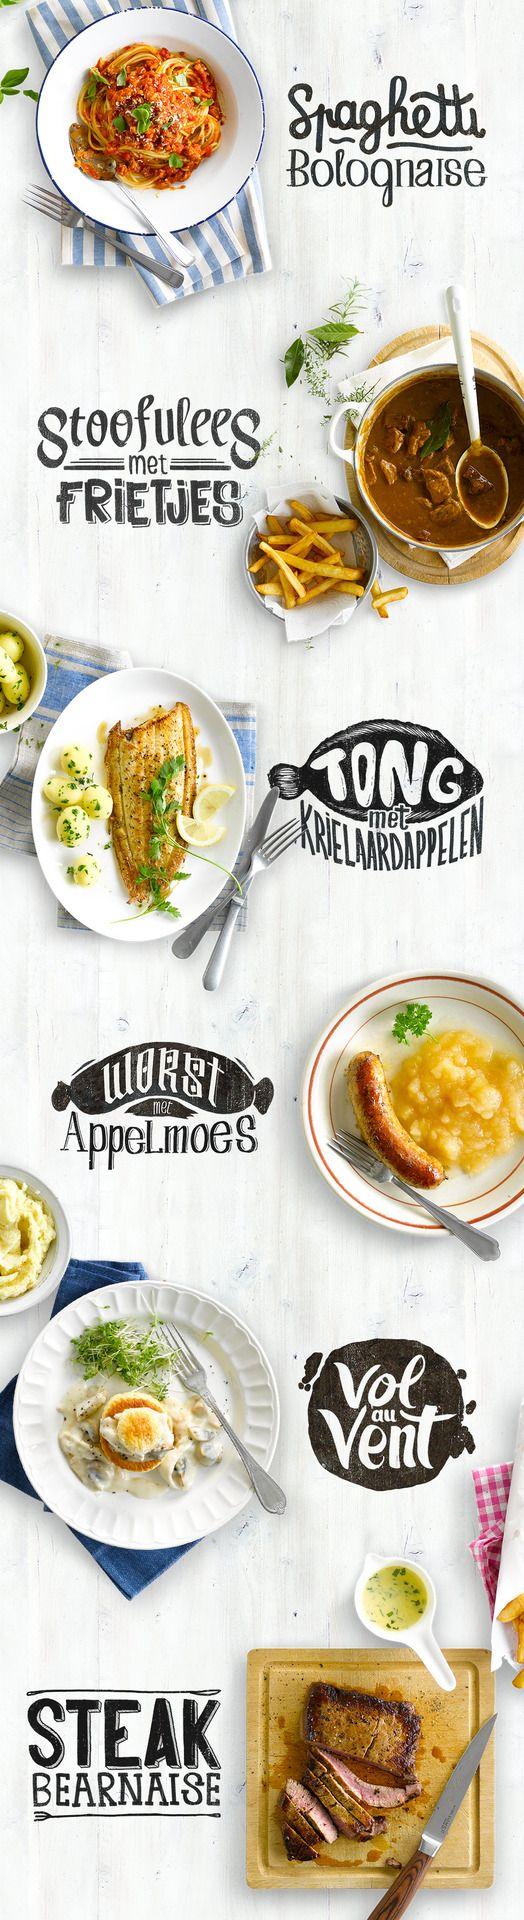 Food design typographyhttps://www.behance.net/gallery/Custom-recipe-typo/14269187